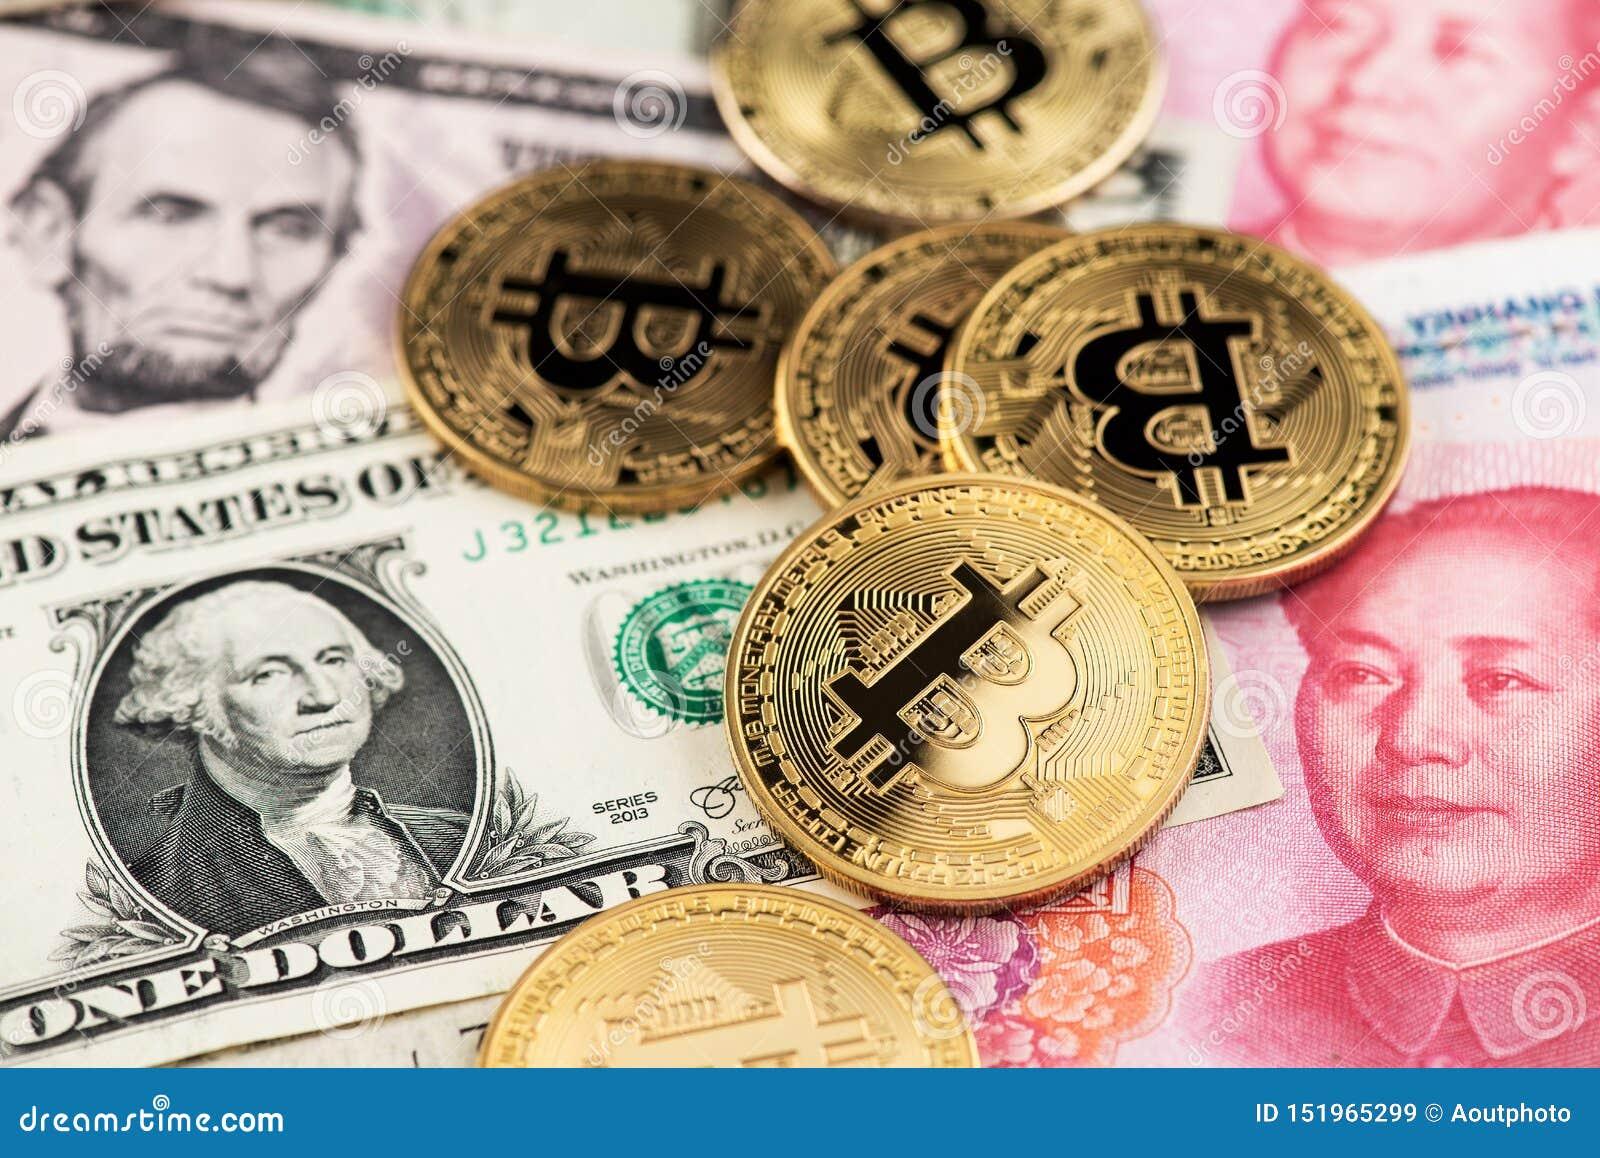 trade bitcoin yuan